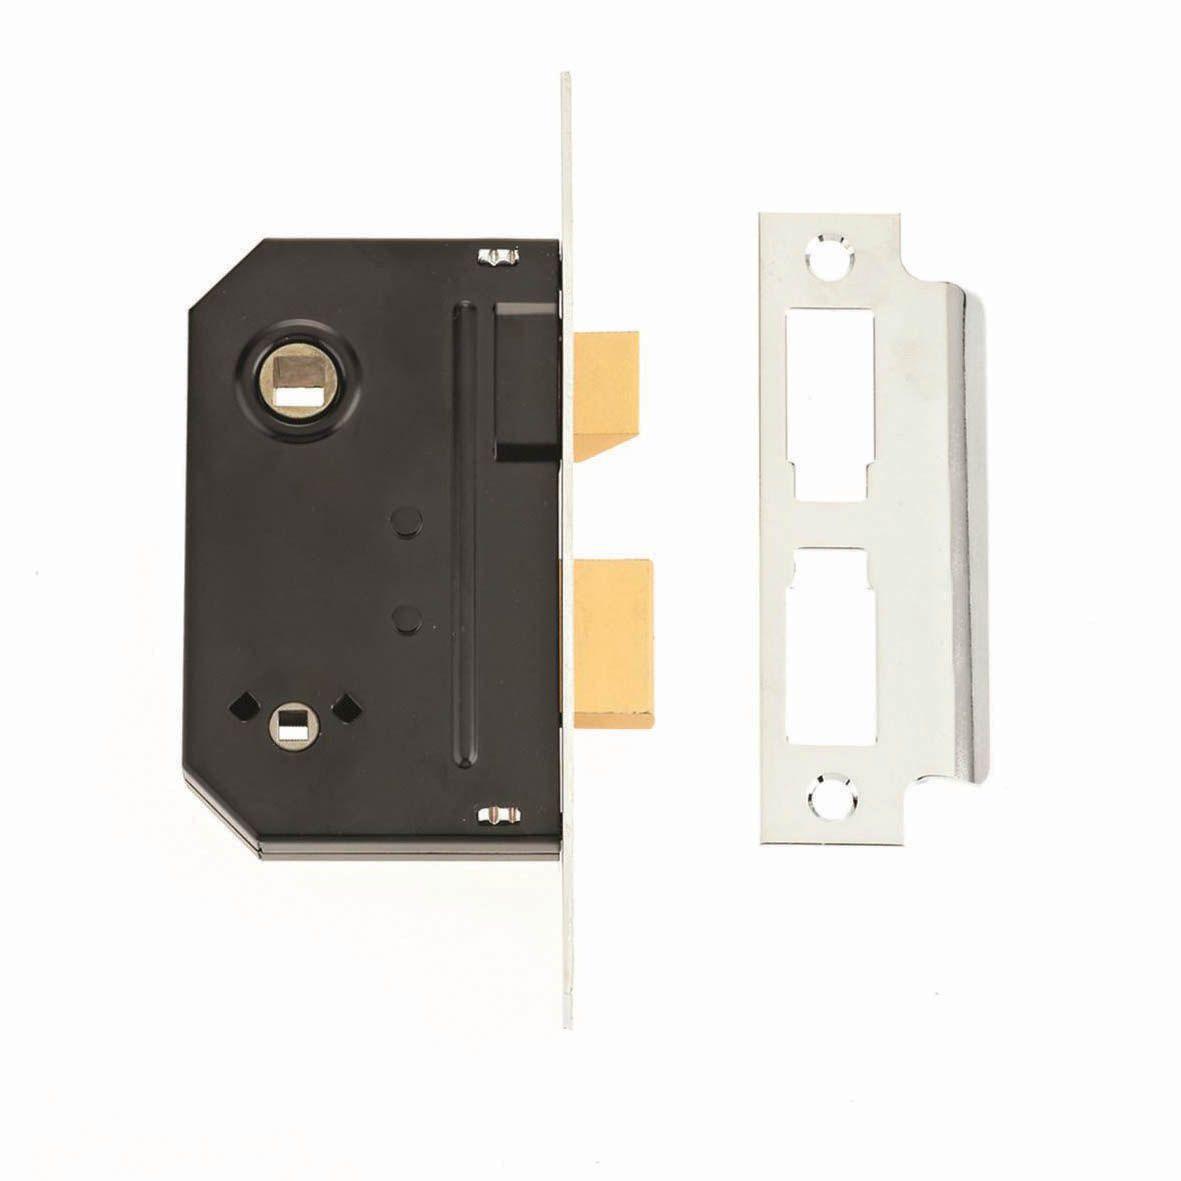 Escape The Bathroom Lock Code union 64mm chrome effect bathroom mortice lock | departments | diy